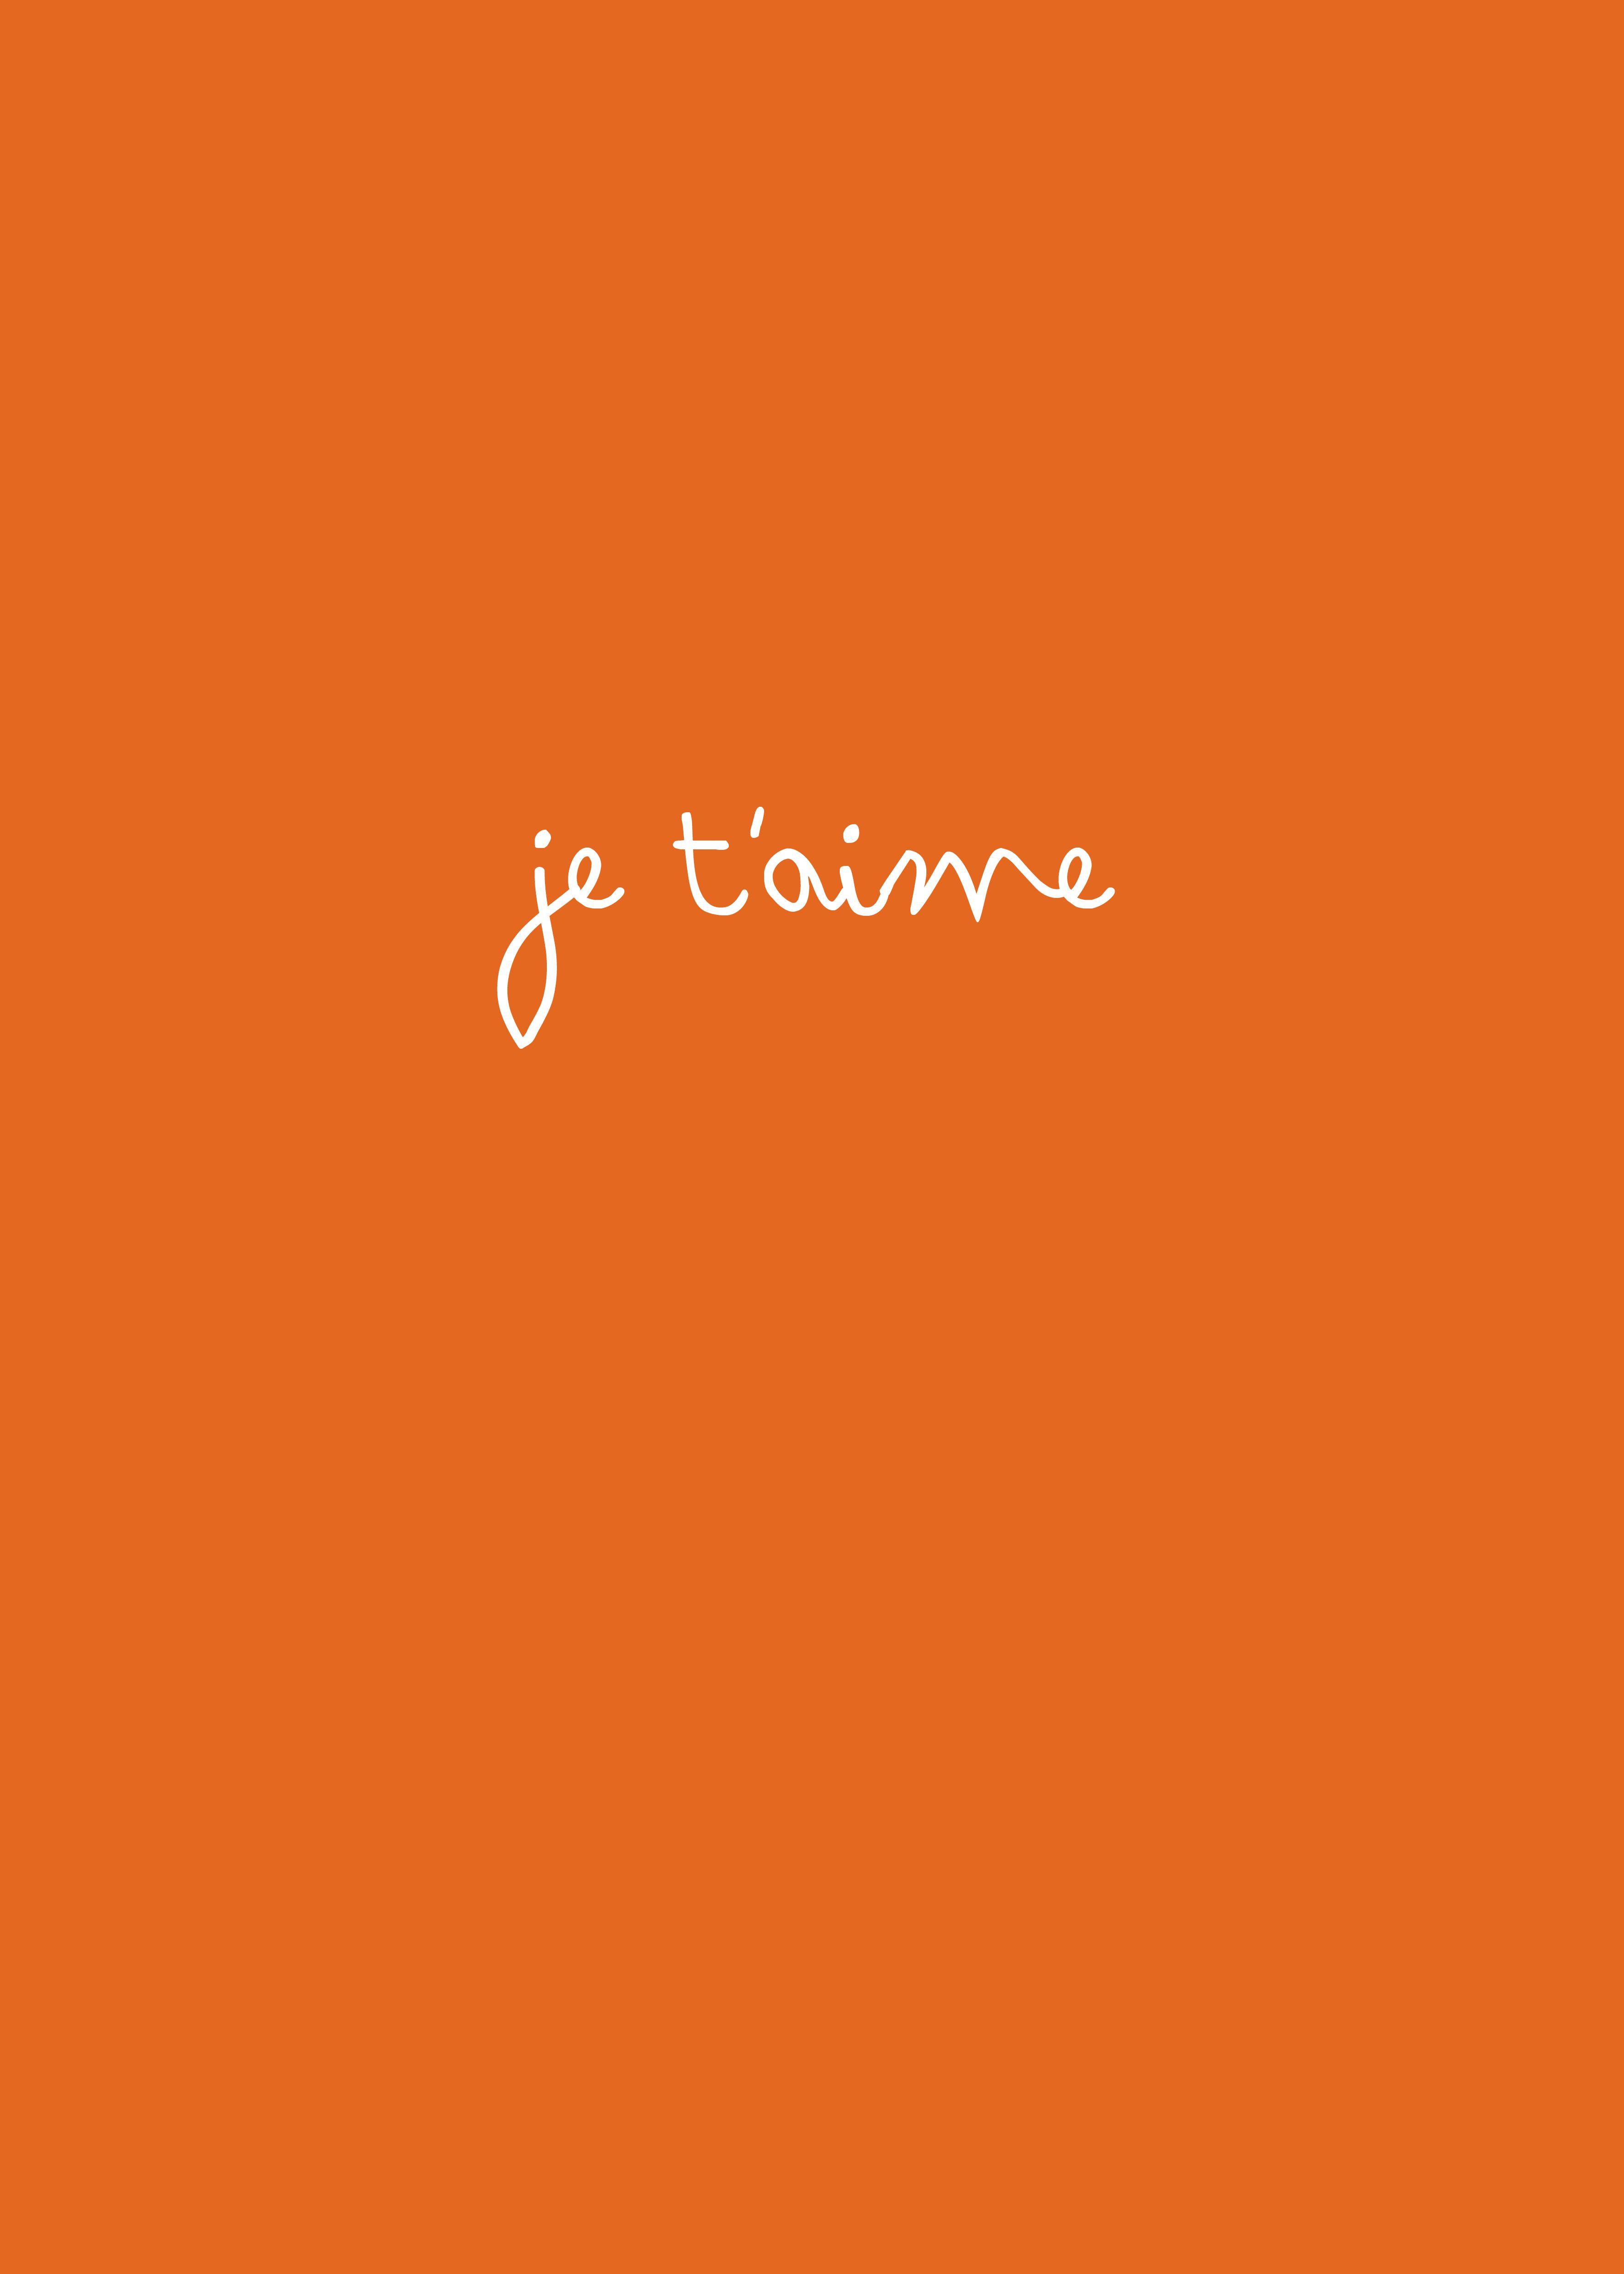 Orange french love quote ★ iPhone wallpaper Woorden, Oranje